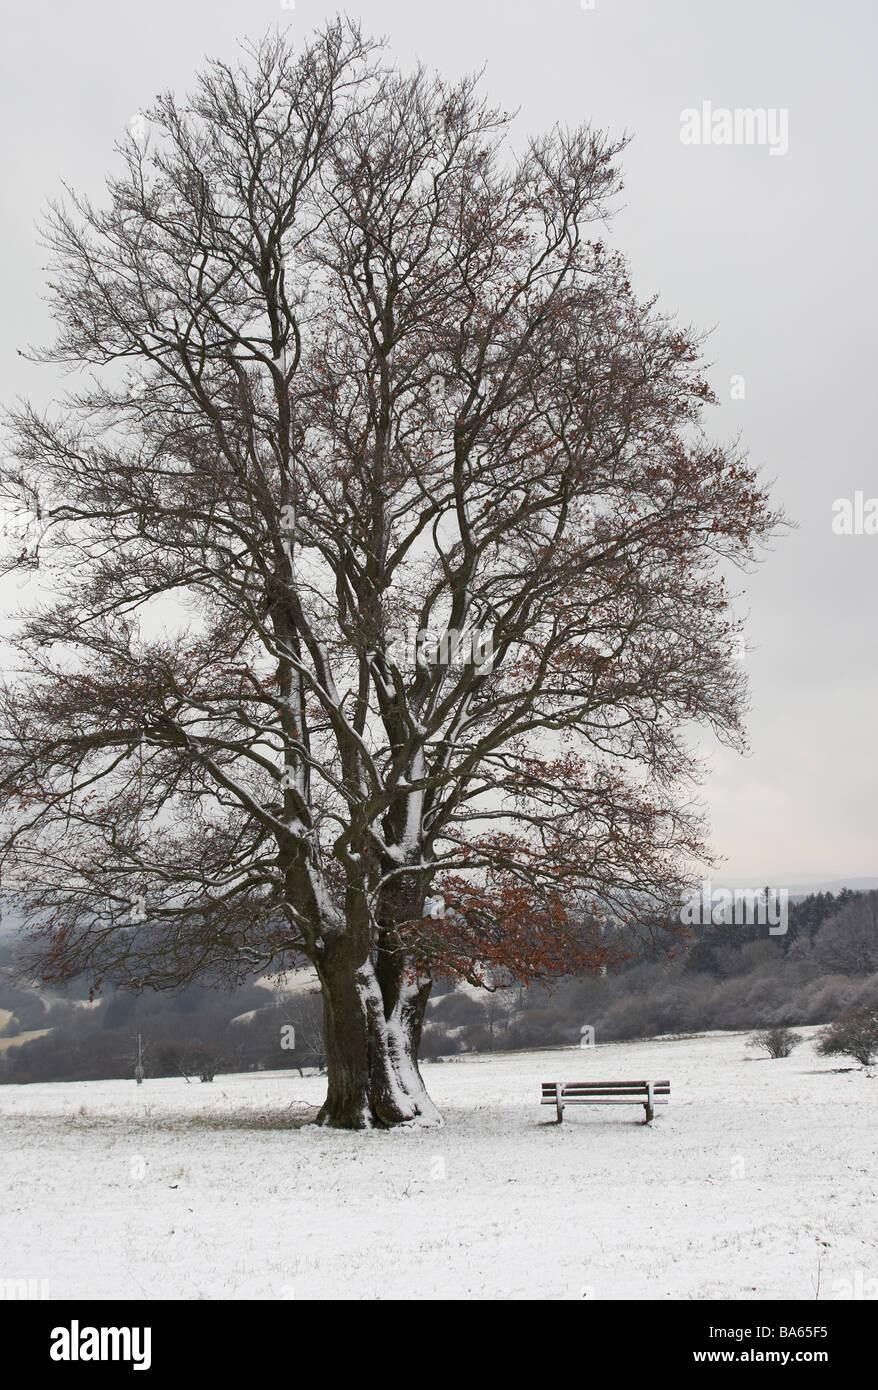 Beech in winter - Stock Image